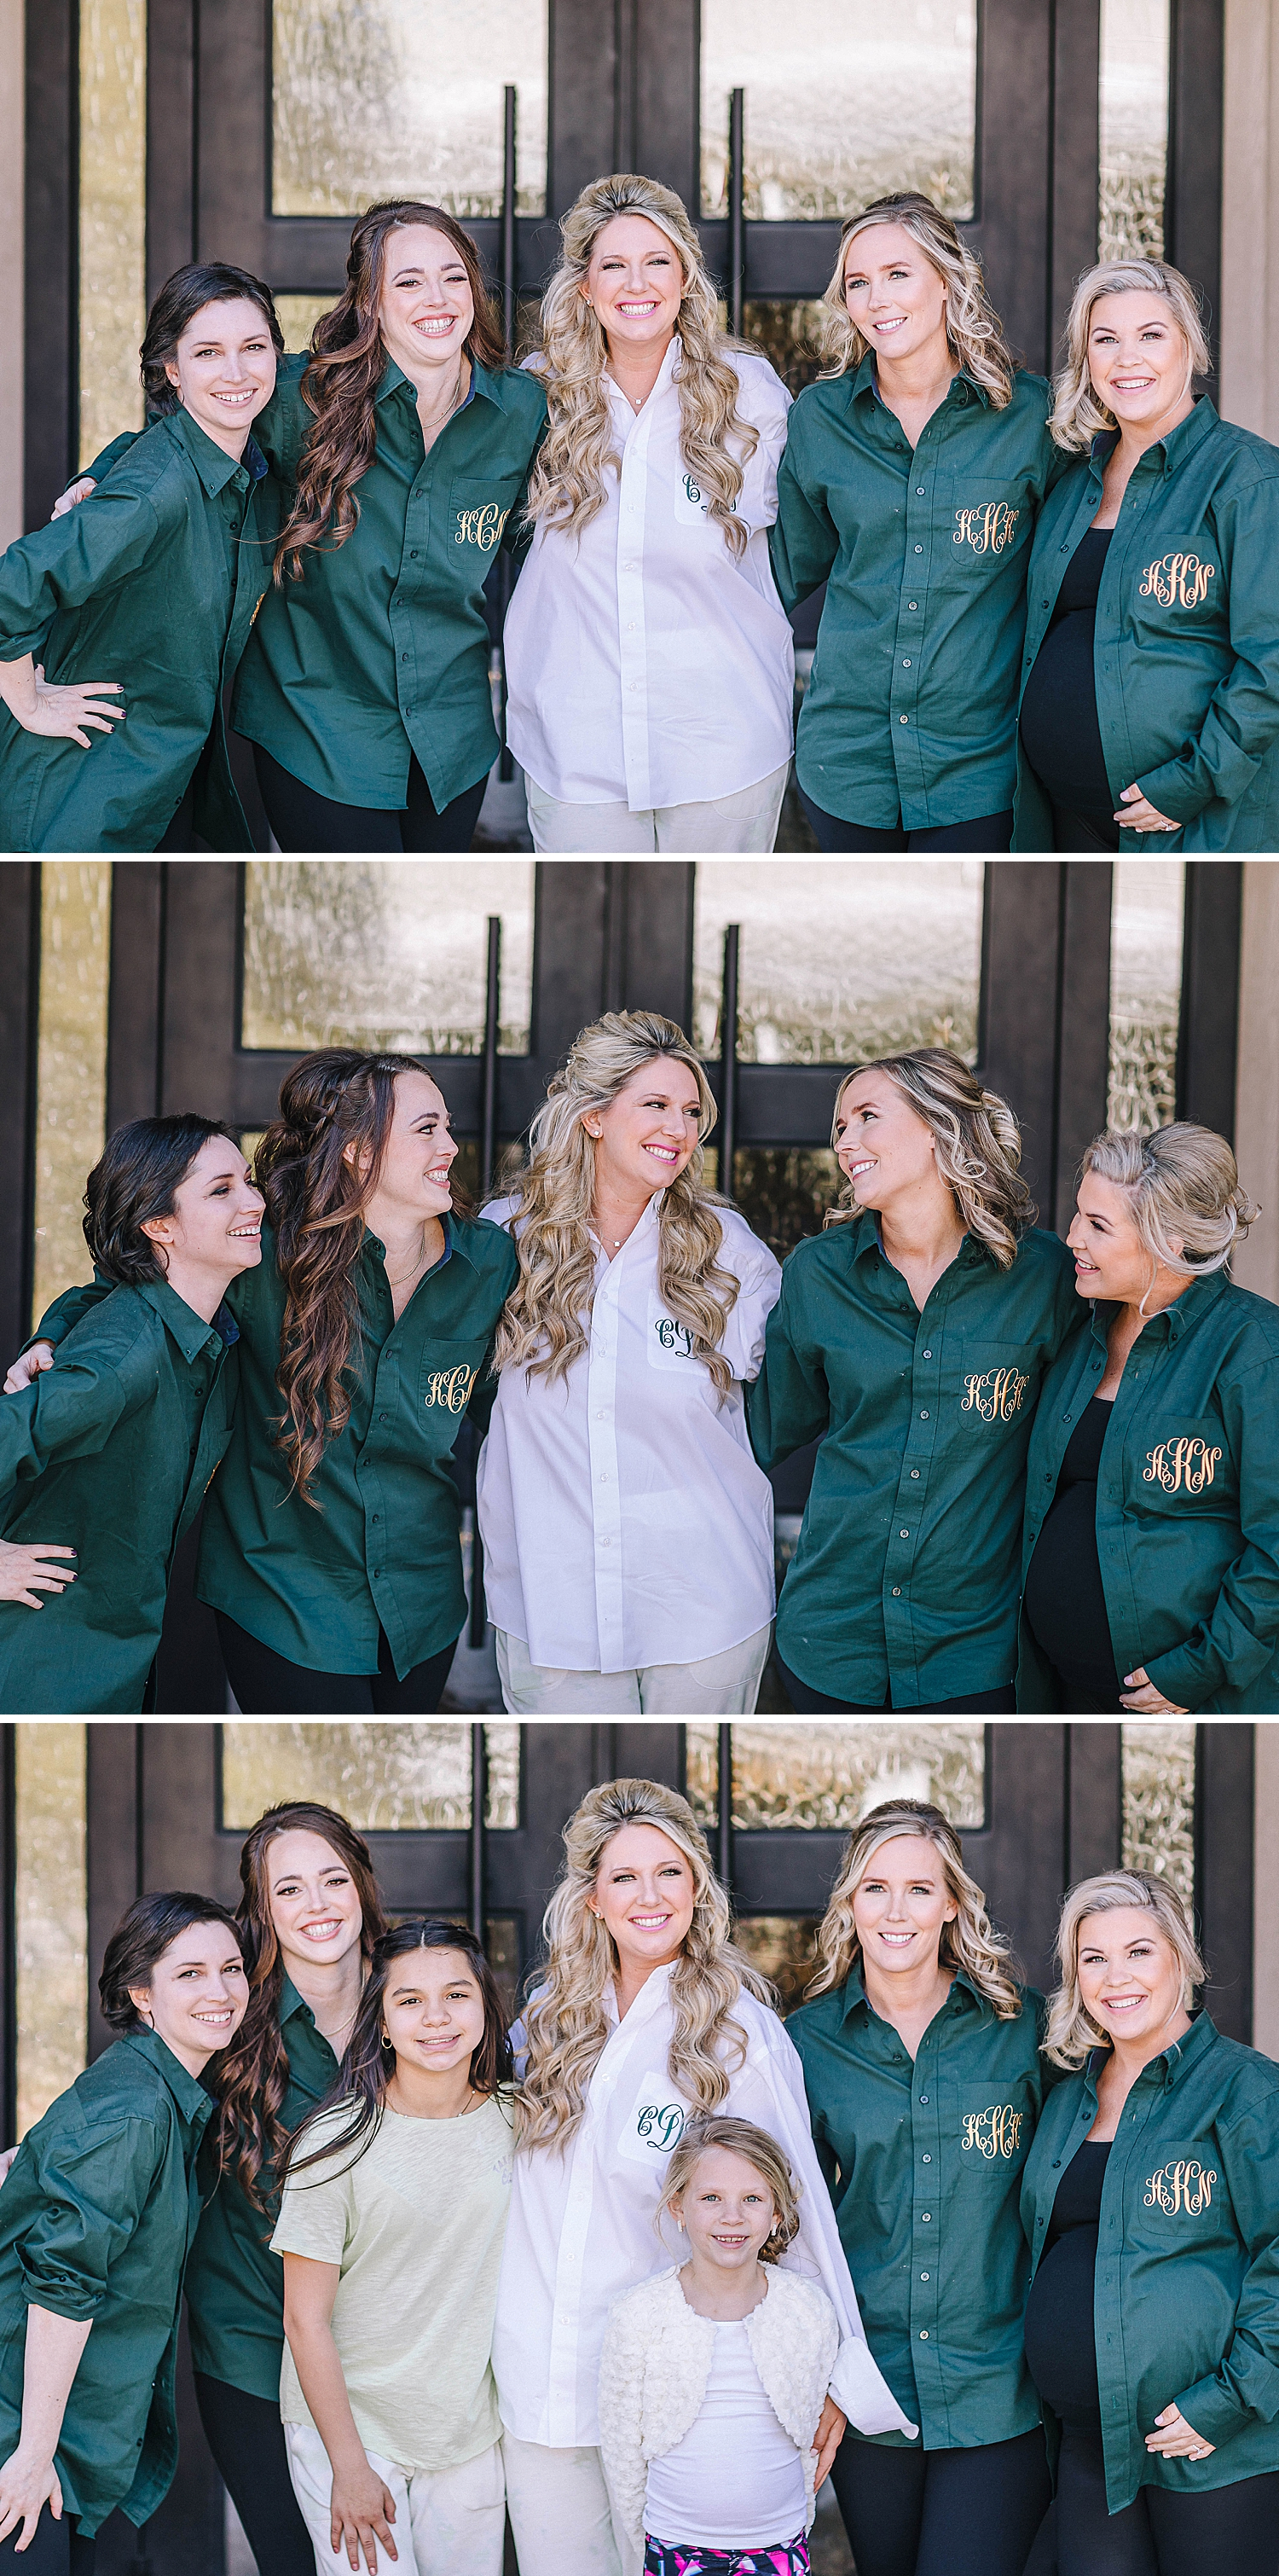 Magnolia-Halle-Wedding-San-Antonio-Texas-Bride-Grom_0016.jpg